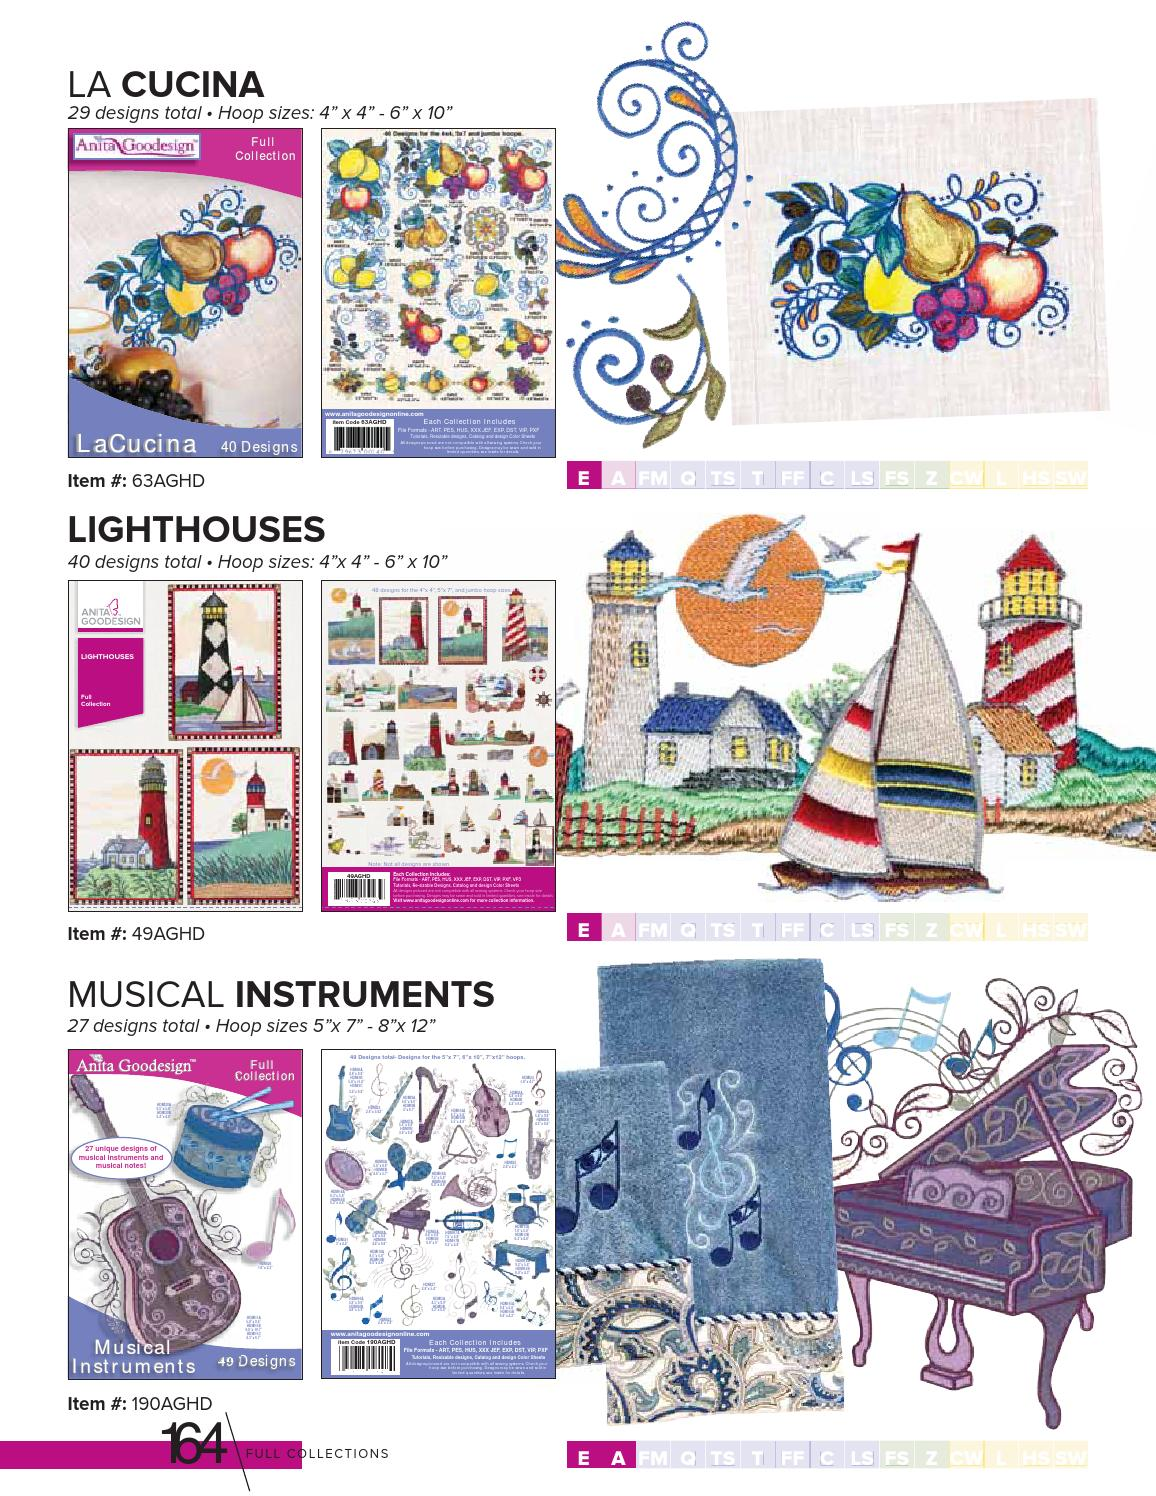 Autumn Sampler Anita Goodesign Embroidery Machine Design CD NEW 128AGHD